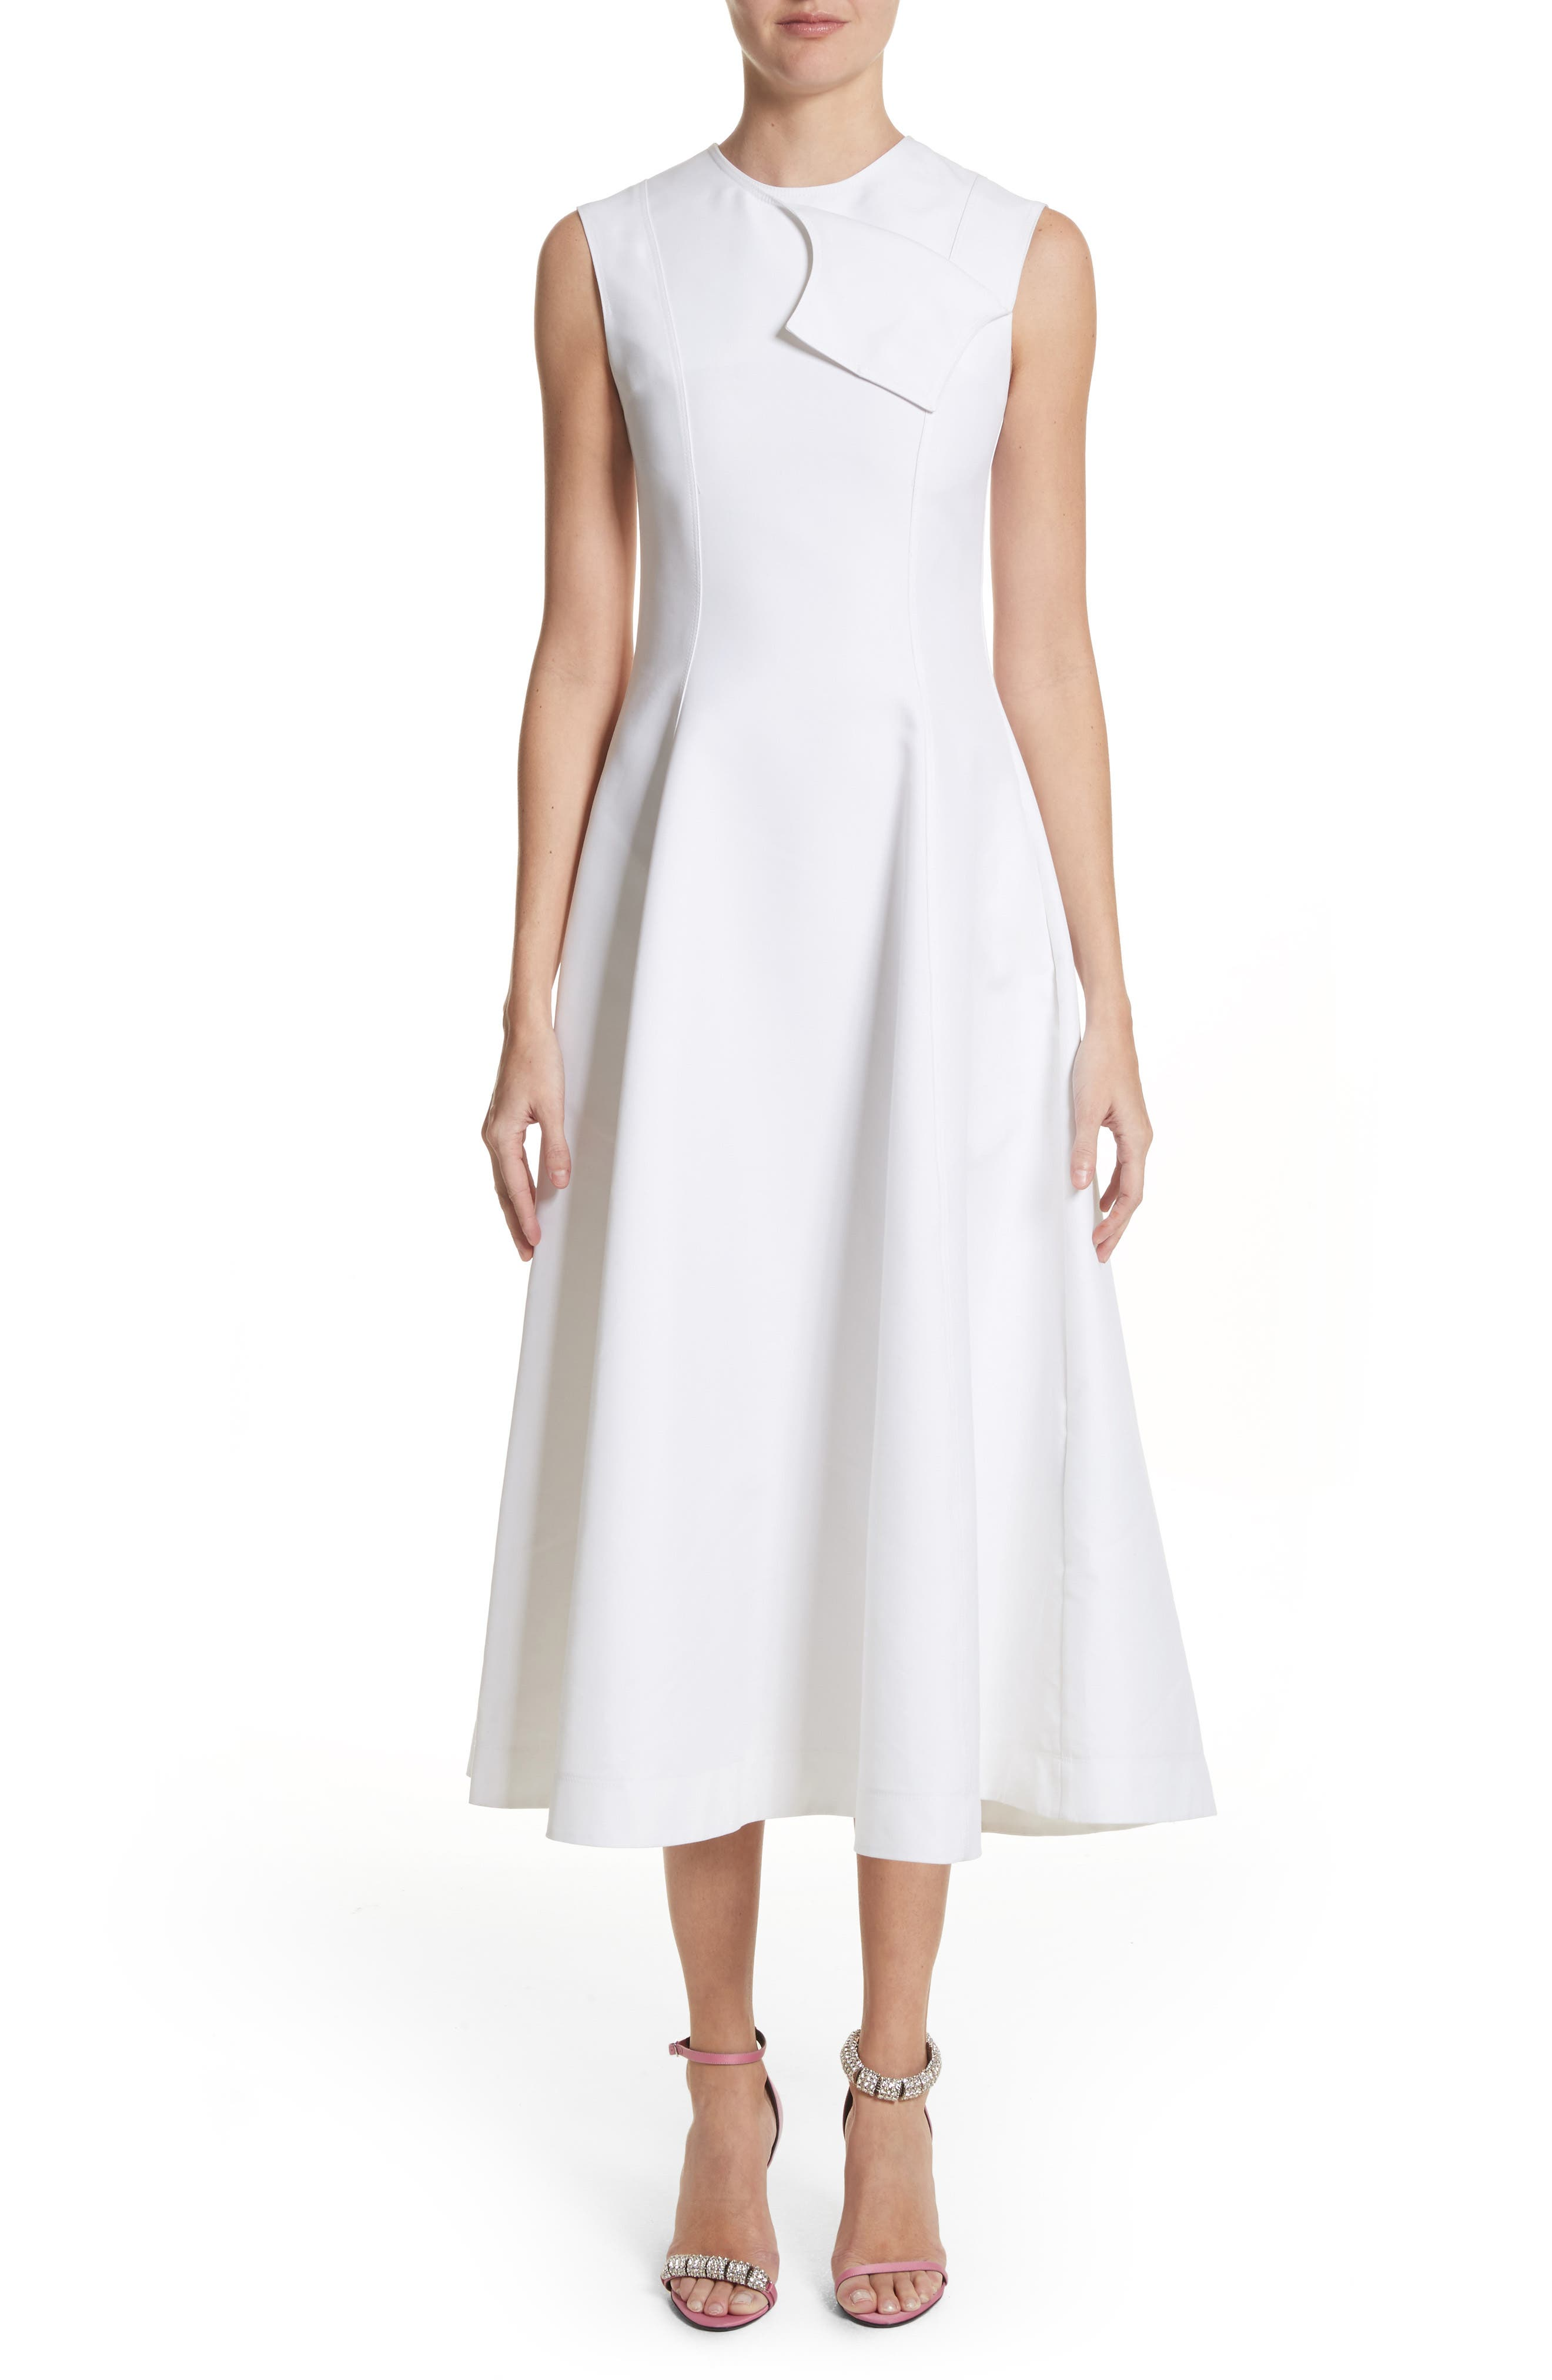 Flap Detail A-Line Dress,                             Main thumbnail 1, color,                             OPTIC WHITE